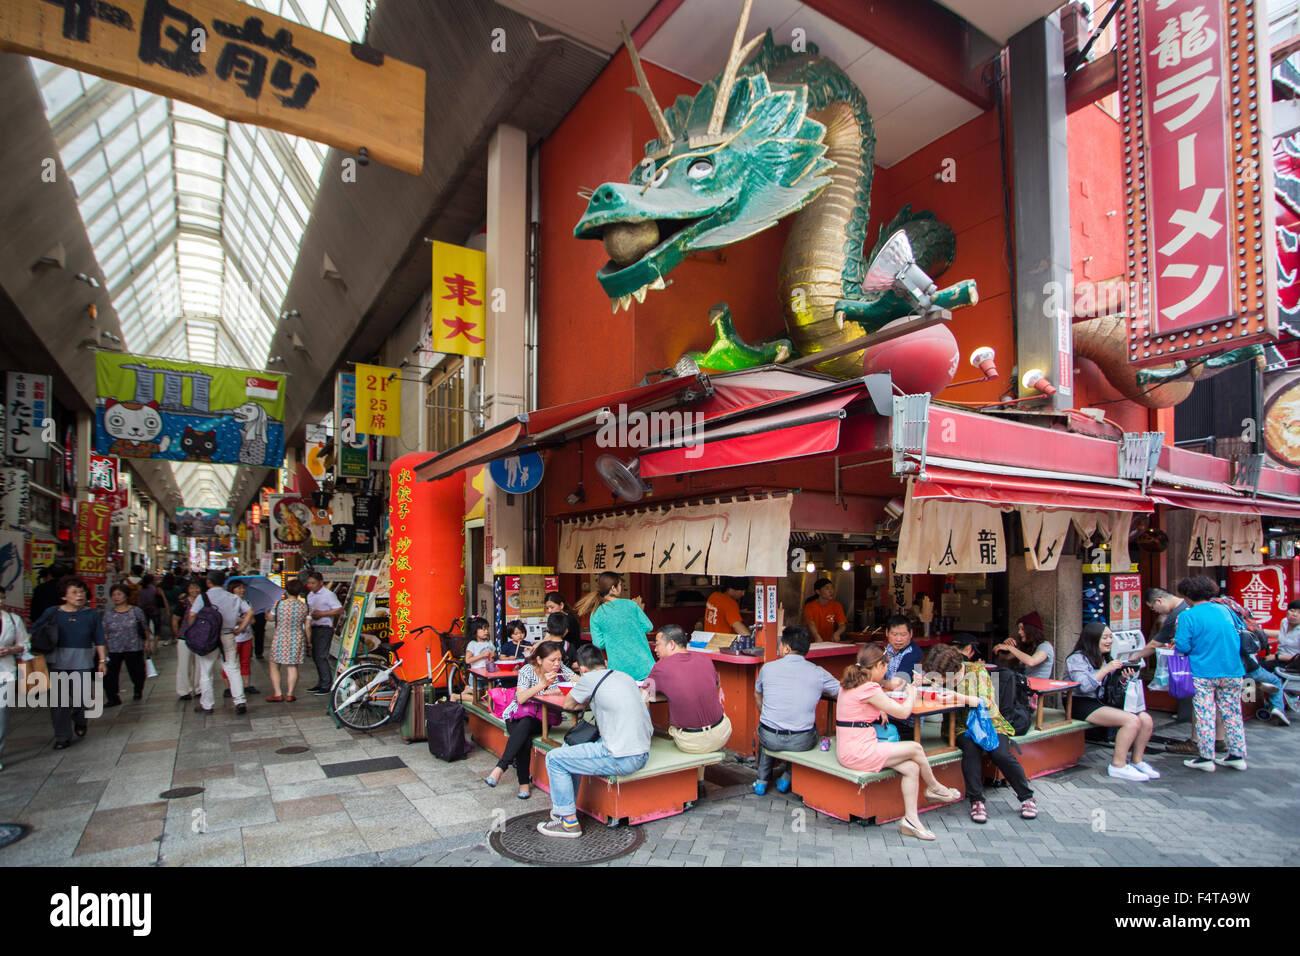 La ciudad de Osaka, Japón, zona de Dotombori, Imagen De Stock